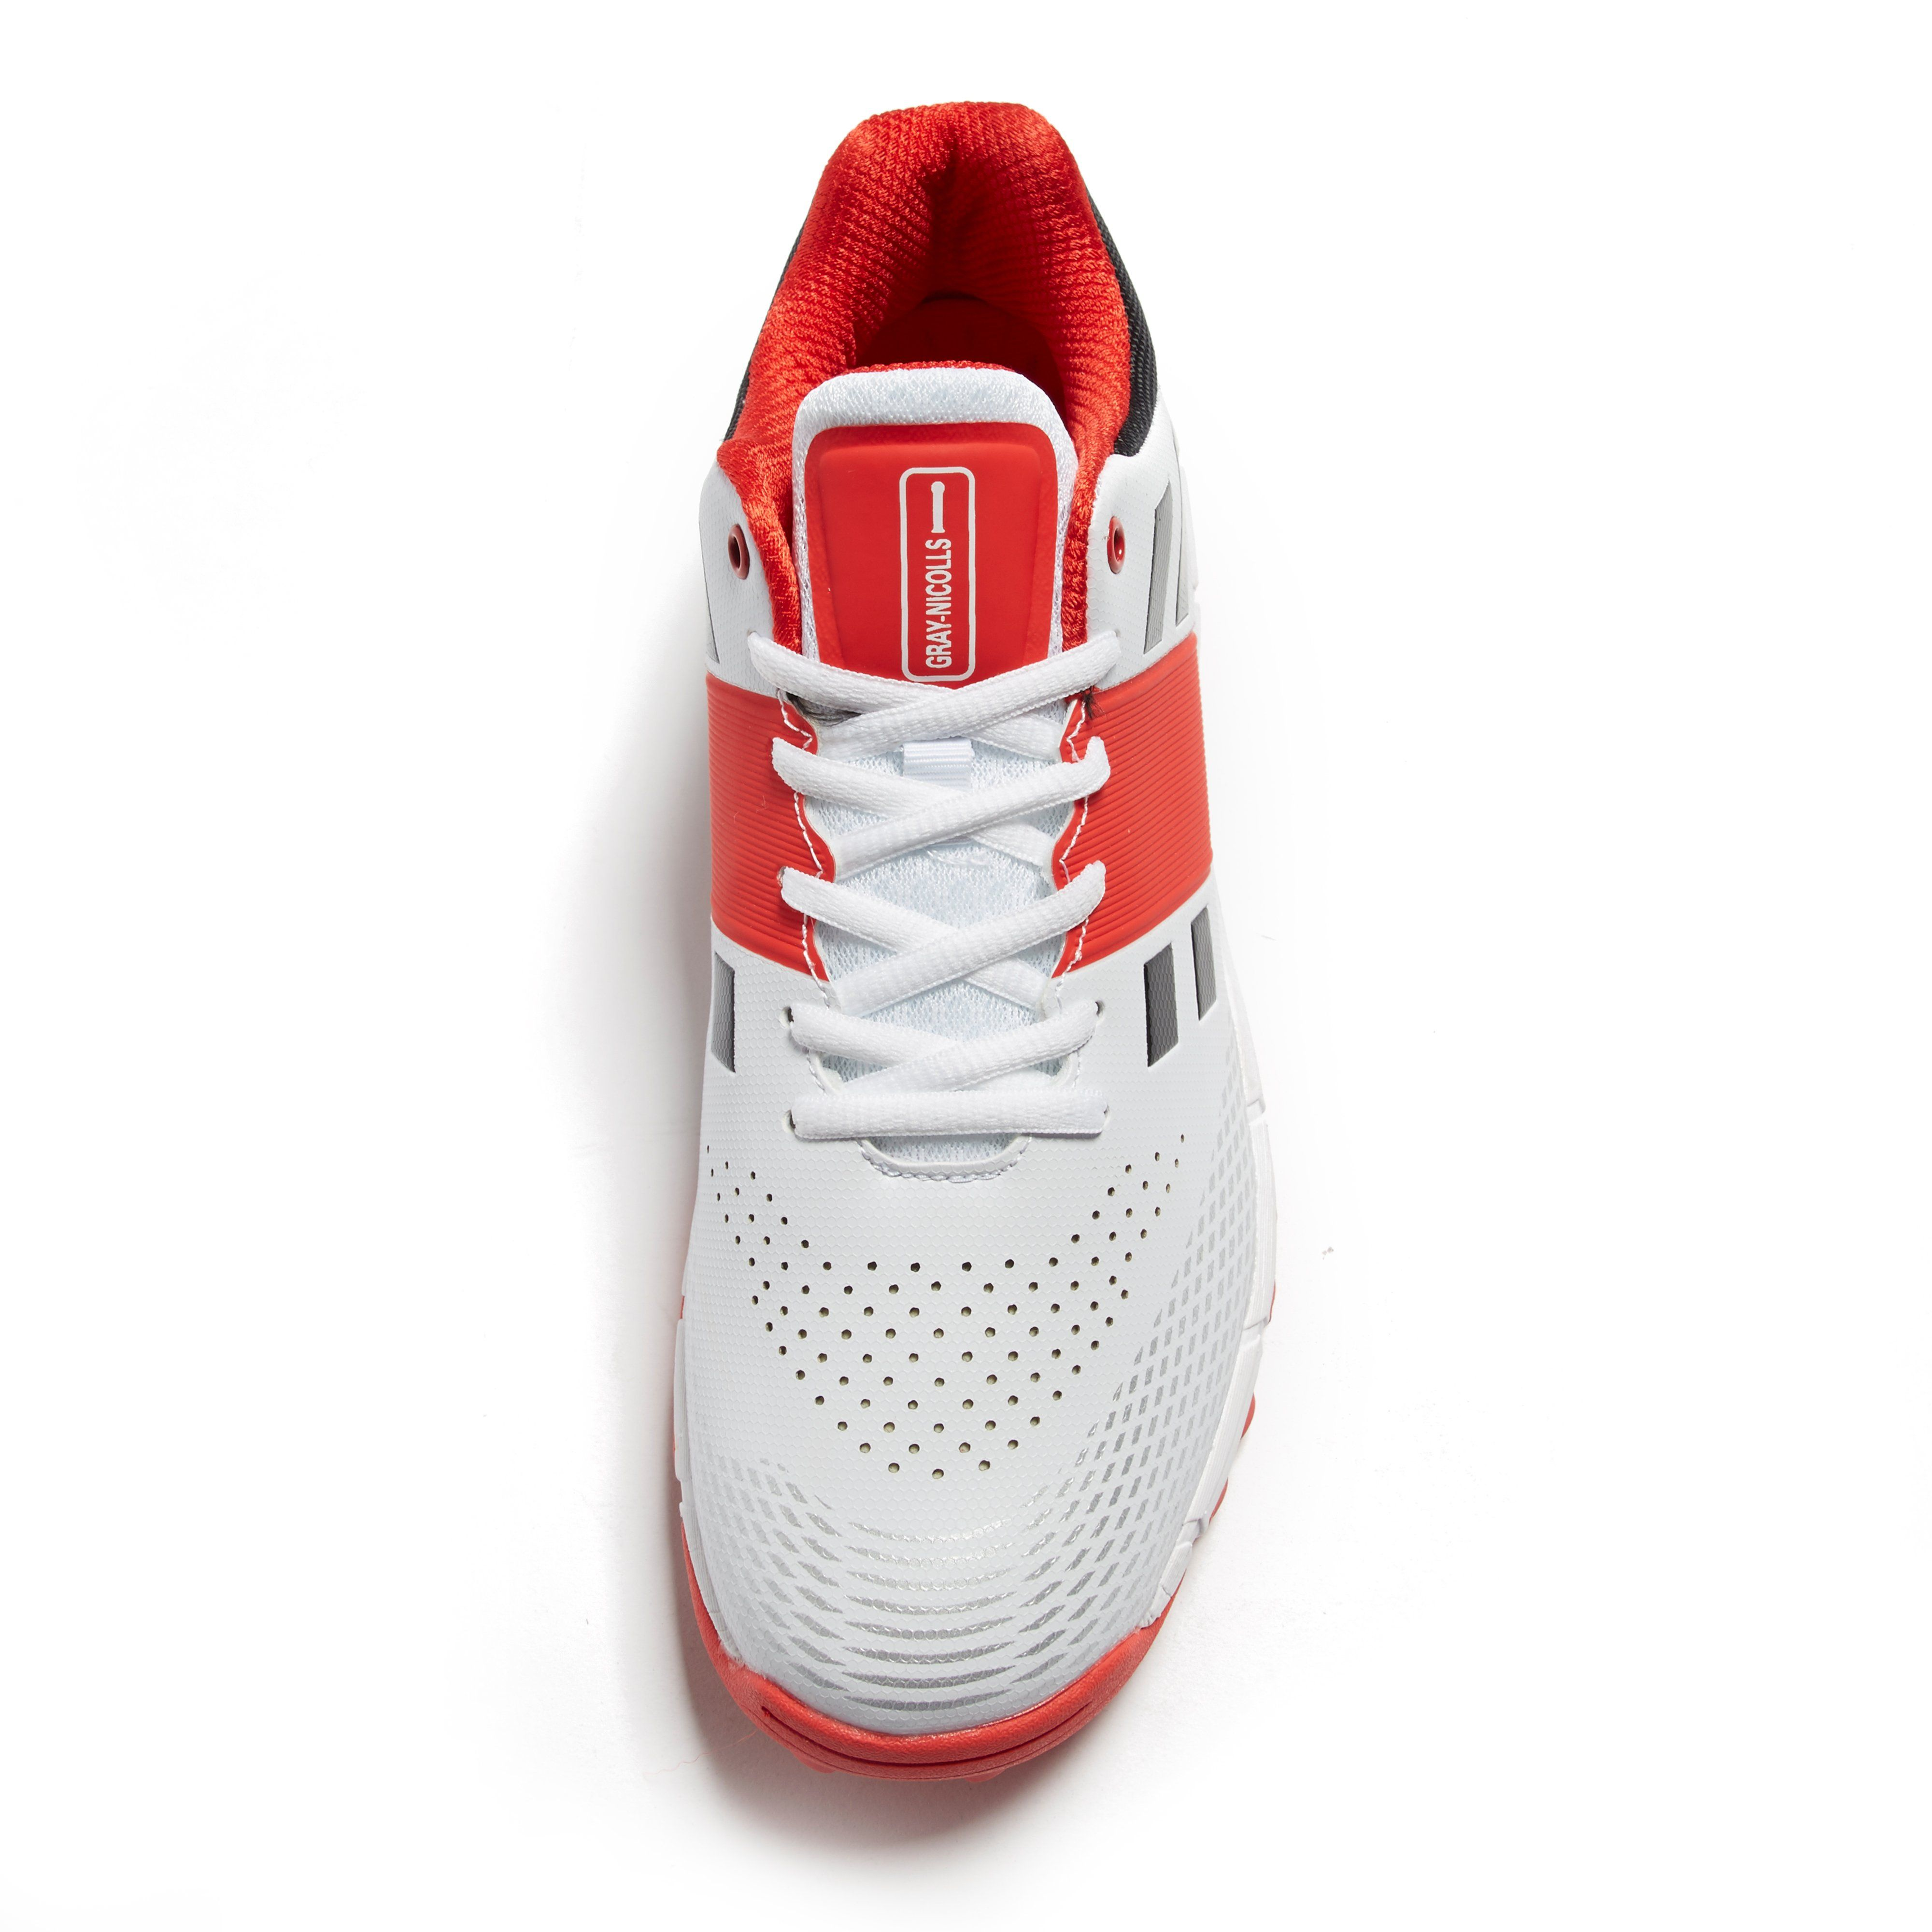 Gray Nicolls Velocity 2.0 Rubber Men's Cricket Shoes